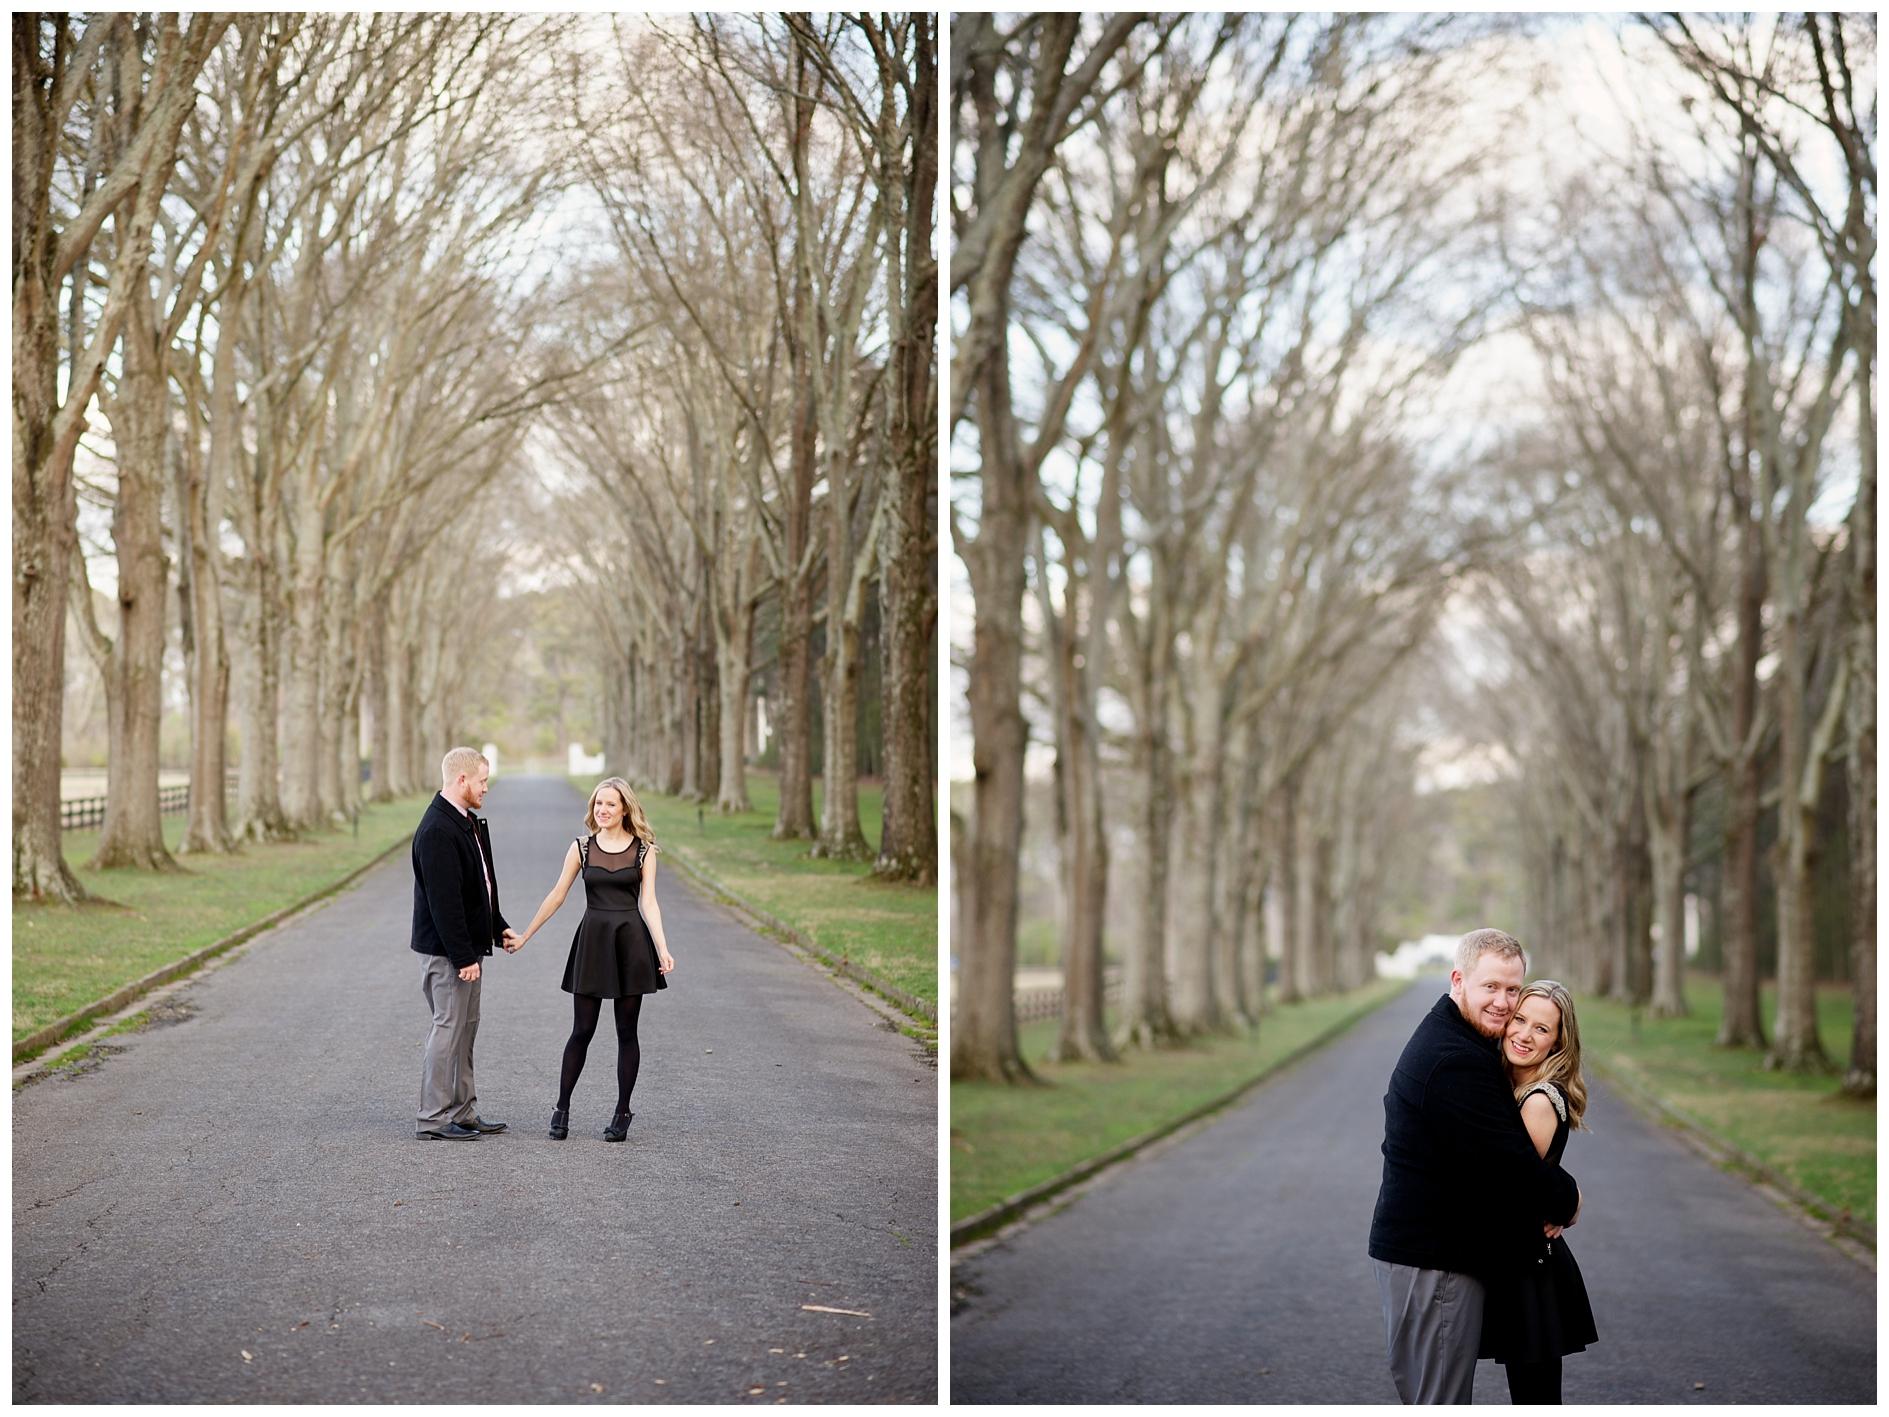 Bloom&Lo_AtlantaPhotographer_AmeliaTatnall_2015_blog_Portfolio_Rome_Georgia_Engagments_BerryCollege_CampWinshape_Amanda&Lucas__0010.jpg